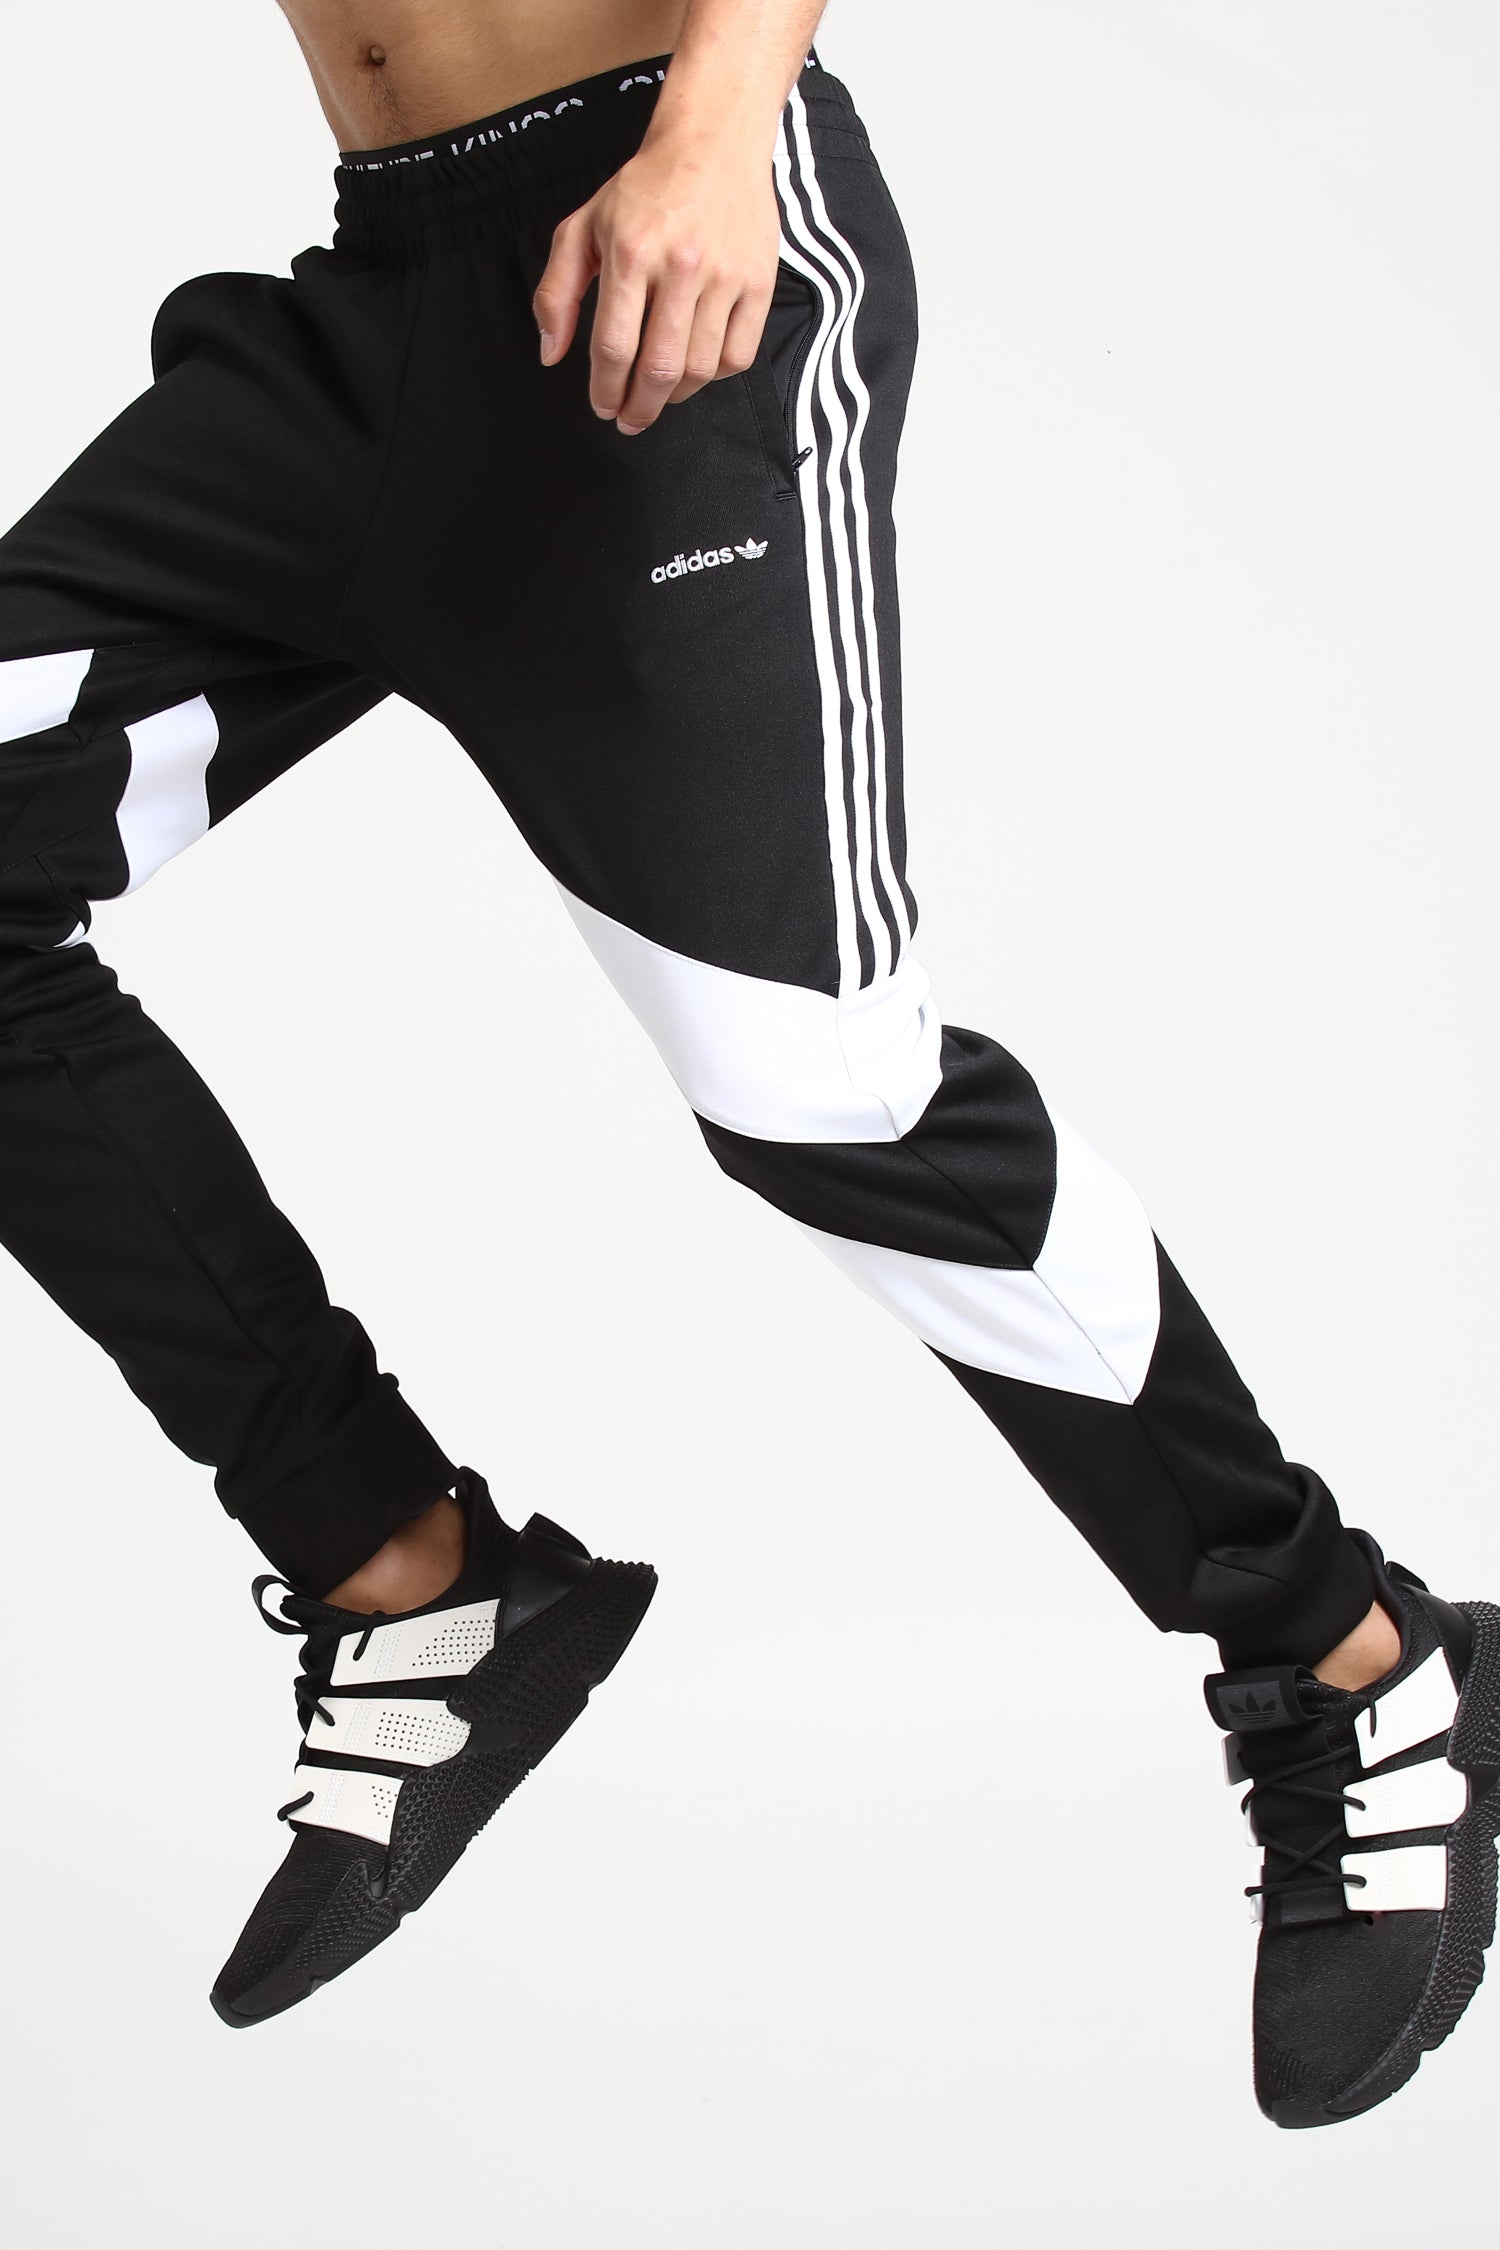 Adidas Palmeston Track Pant BlackWhite